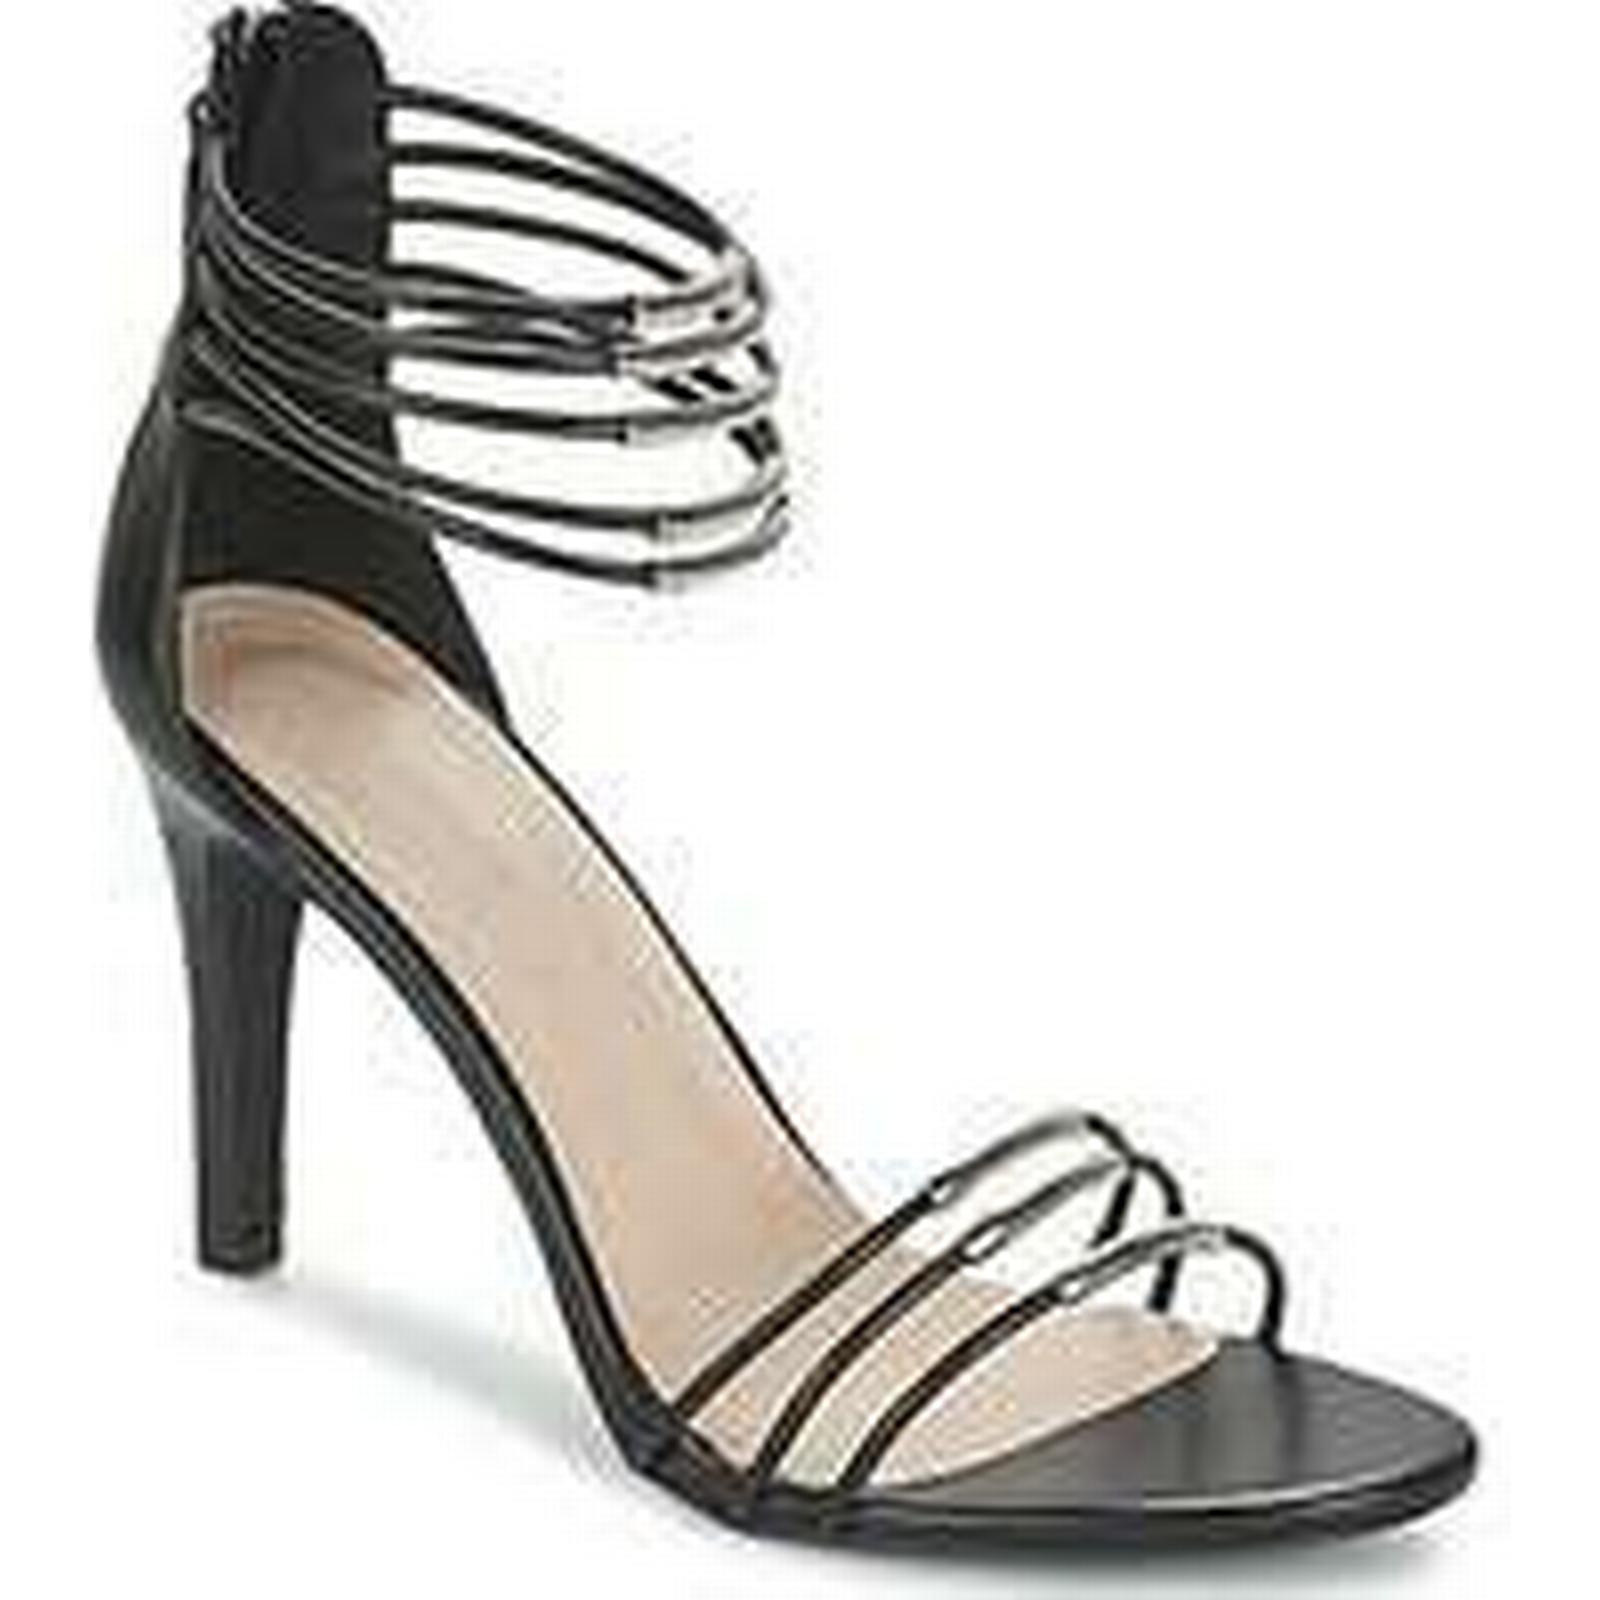 Spartoo.co.uk Ikks SANDALE Black BIJOU women's Sandals in Black SANDALE e2edec